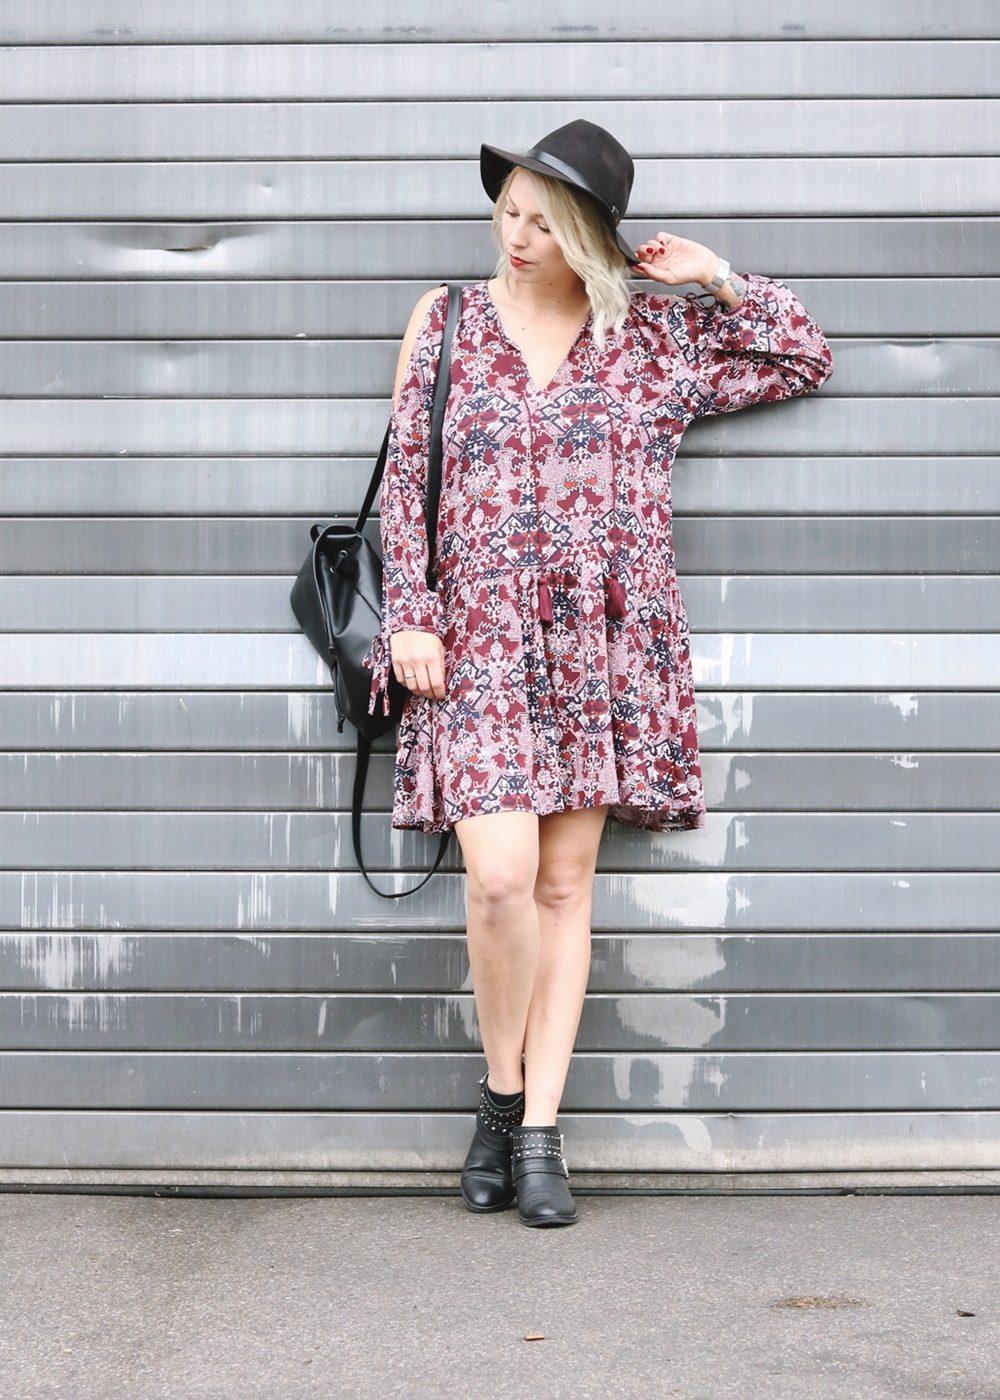 Fashionblogger Outfit Boho Kleid weinrot Bikerboots Rucksack Hut Ethno (5)